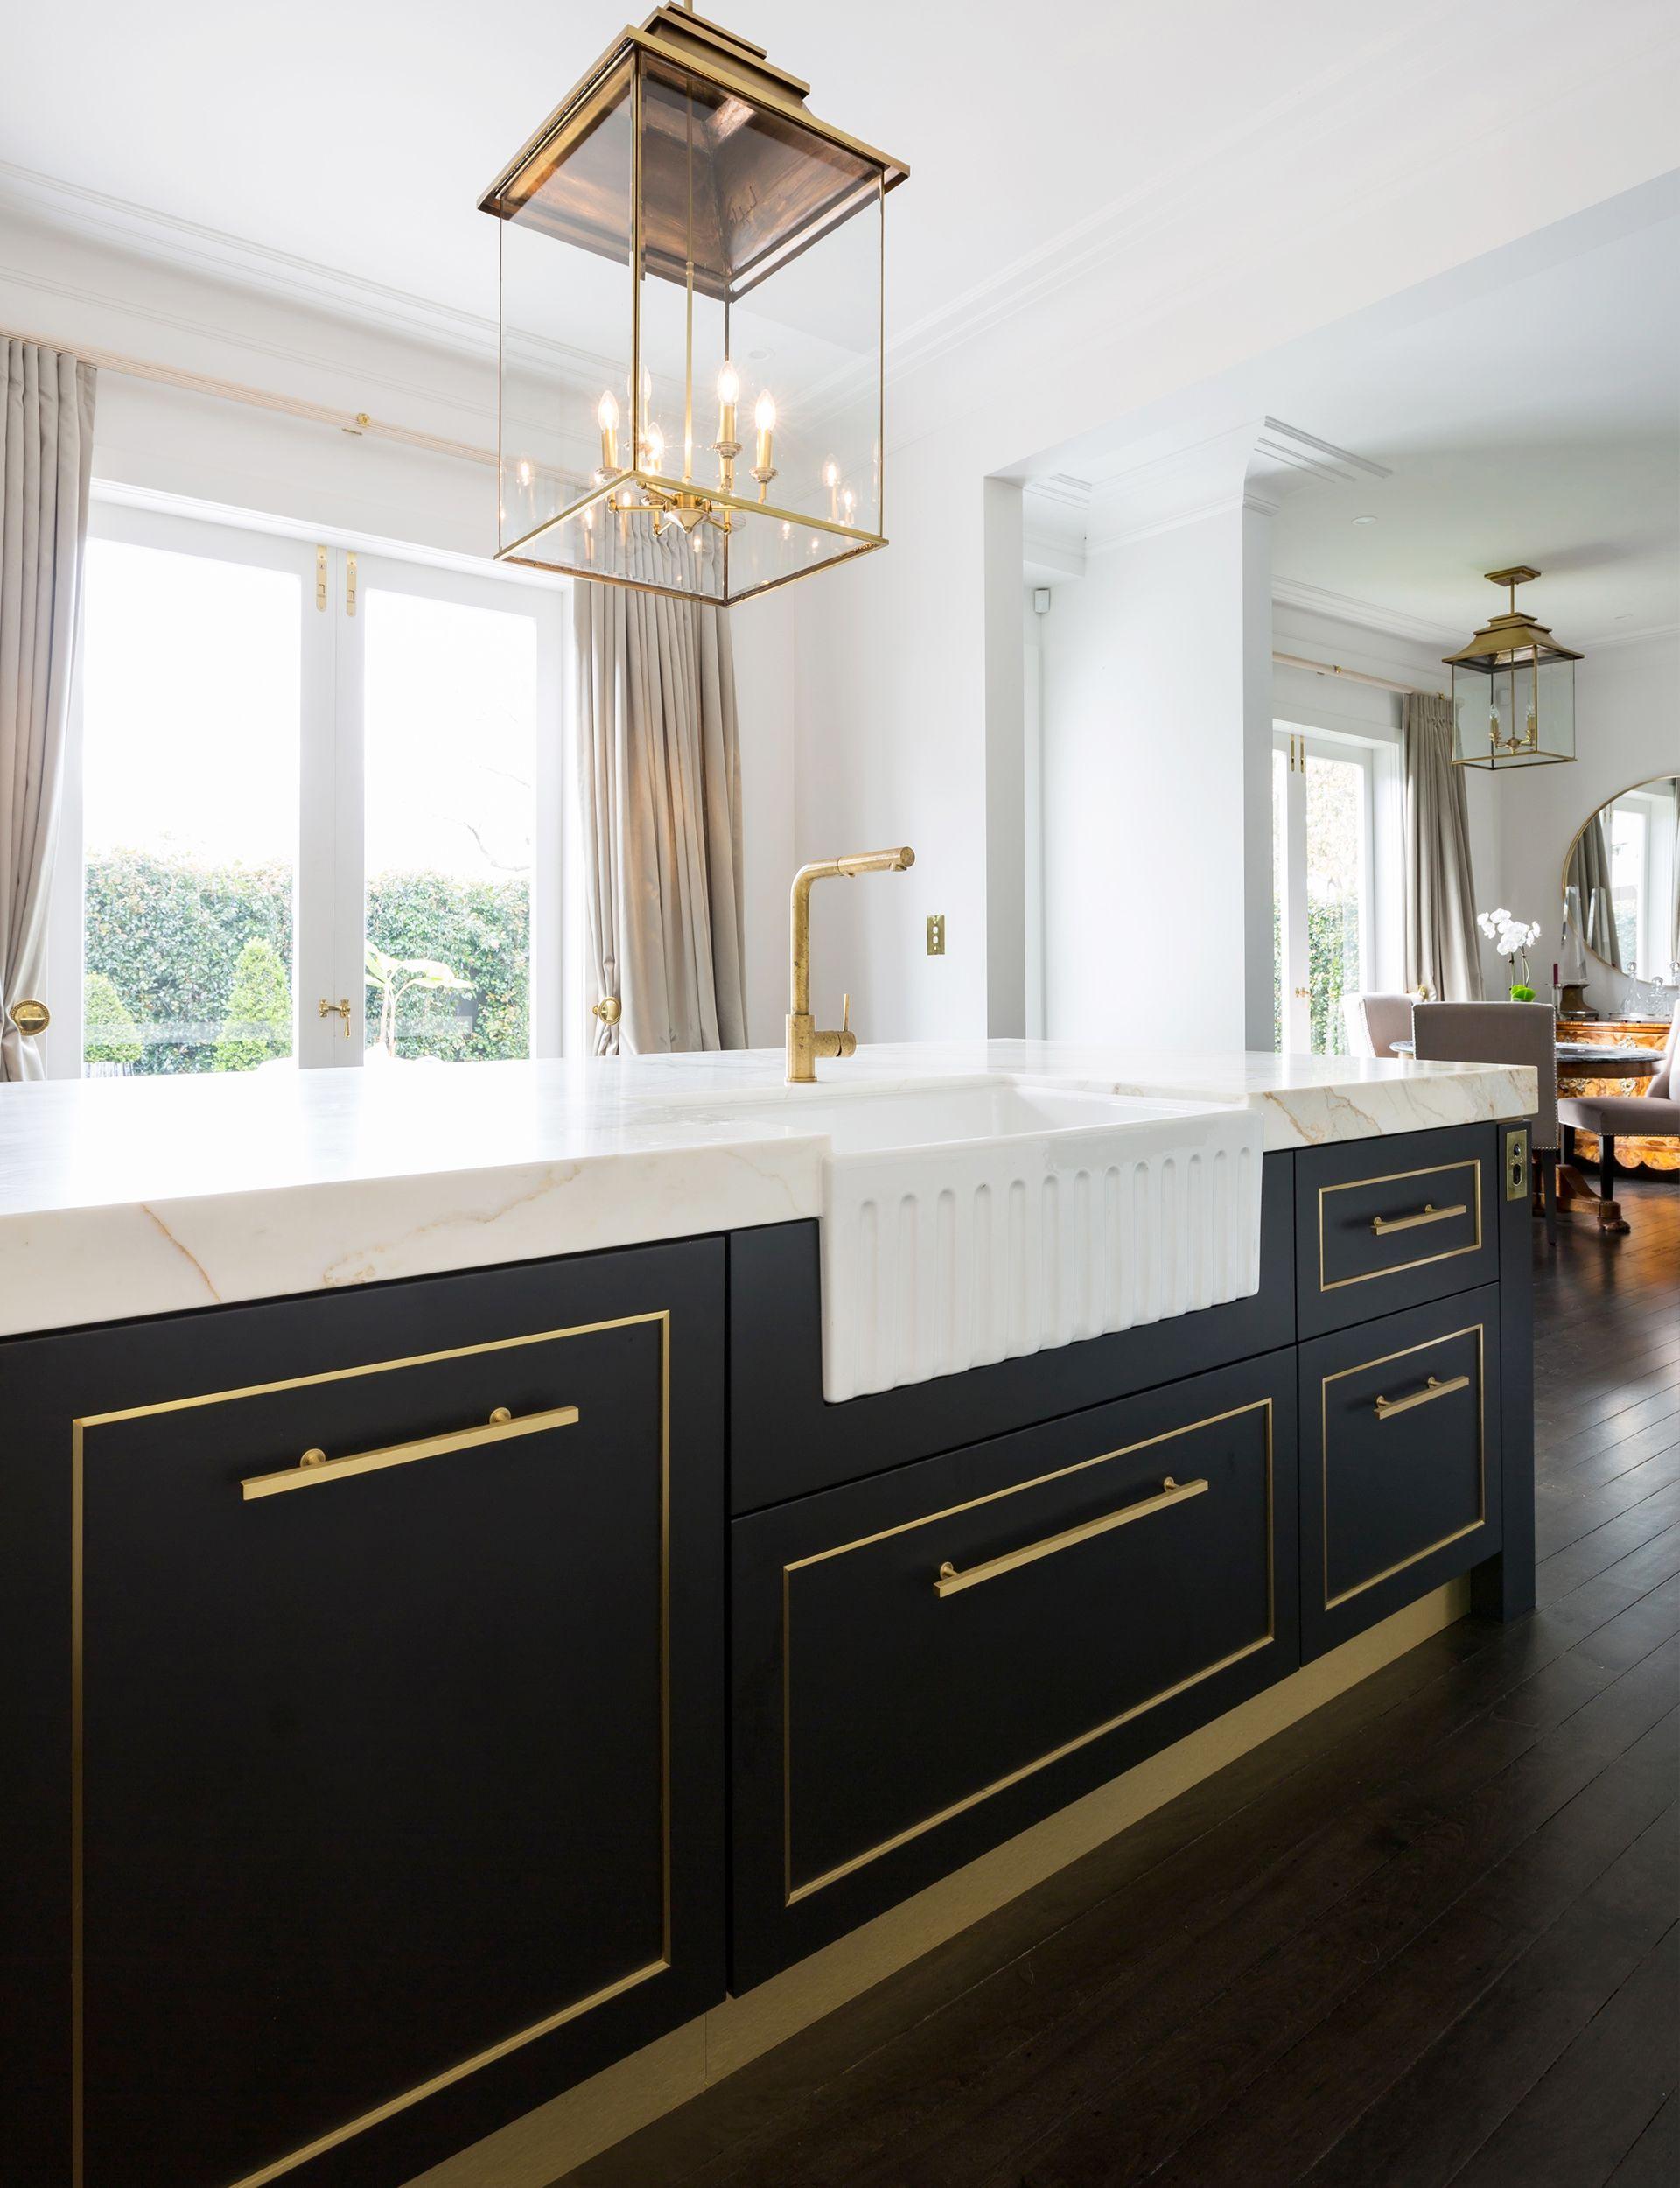 this luxurious kitchen gives storage a stylish edge luxury kitchens elegant kitchens kitchen on kitchen organization elegant id=42965